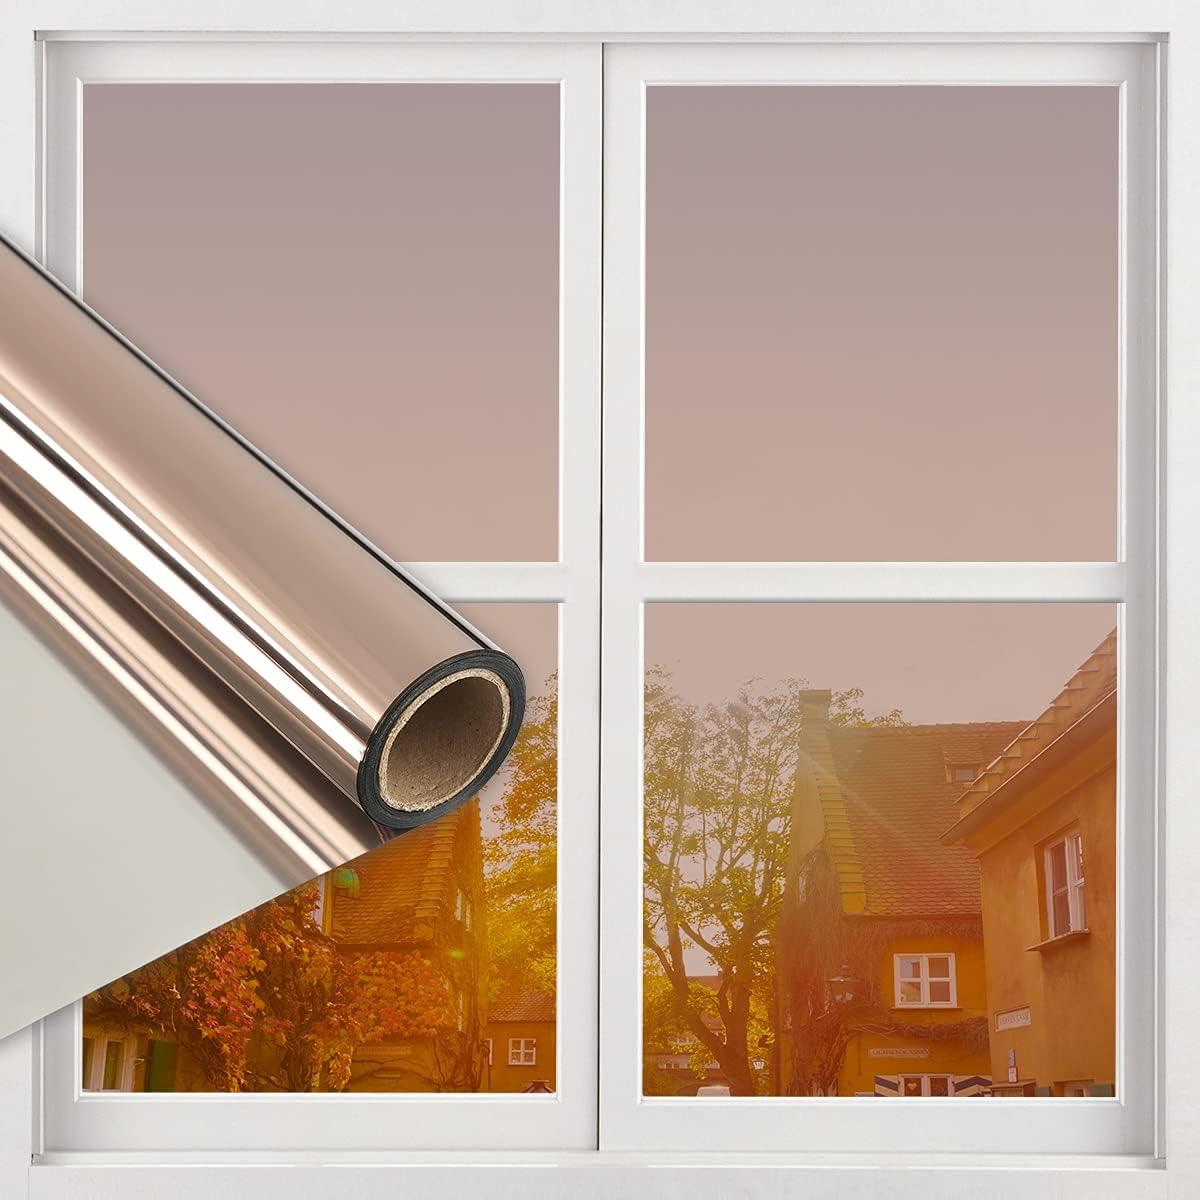 Window Privacy Film One Way Mirror Bloc Daytime Free Shipping New Sun Ranking TOP10 Anti UV